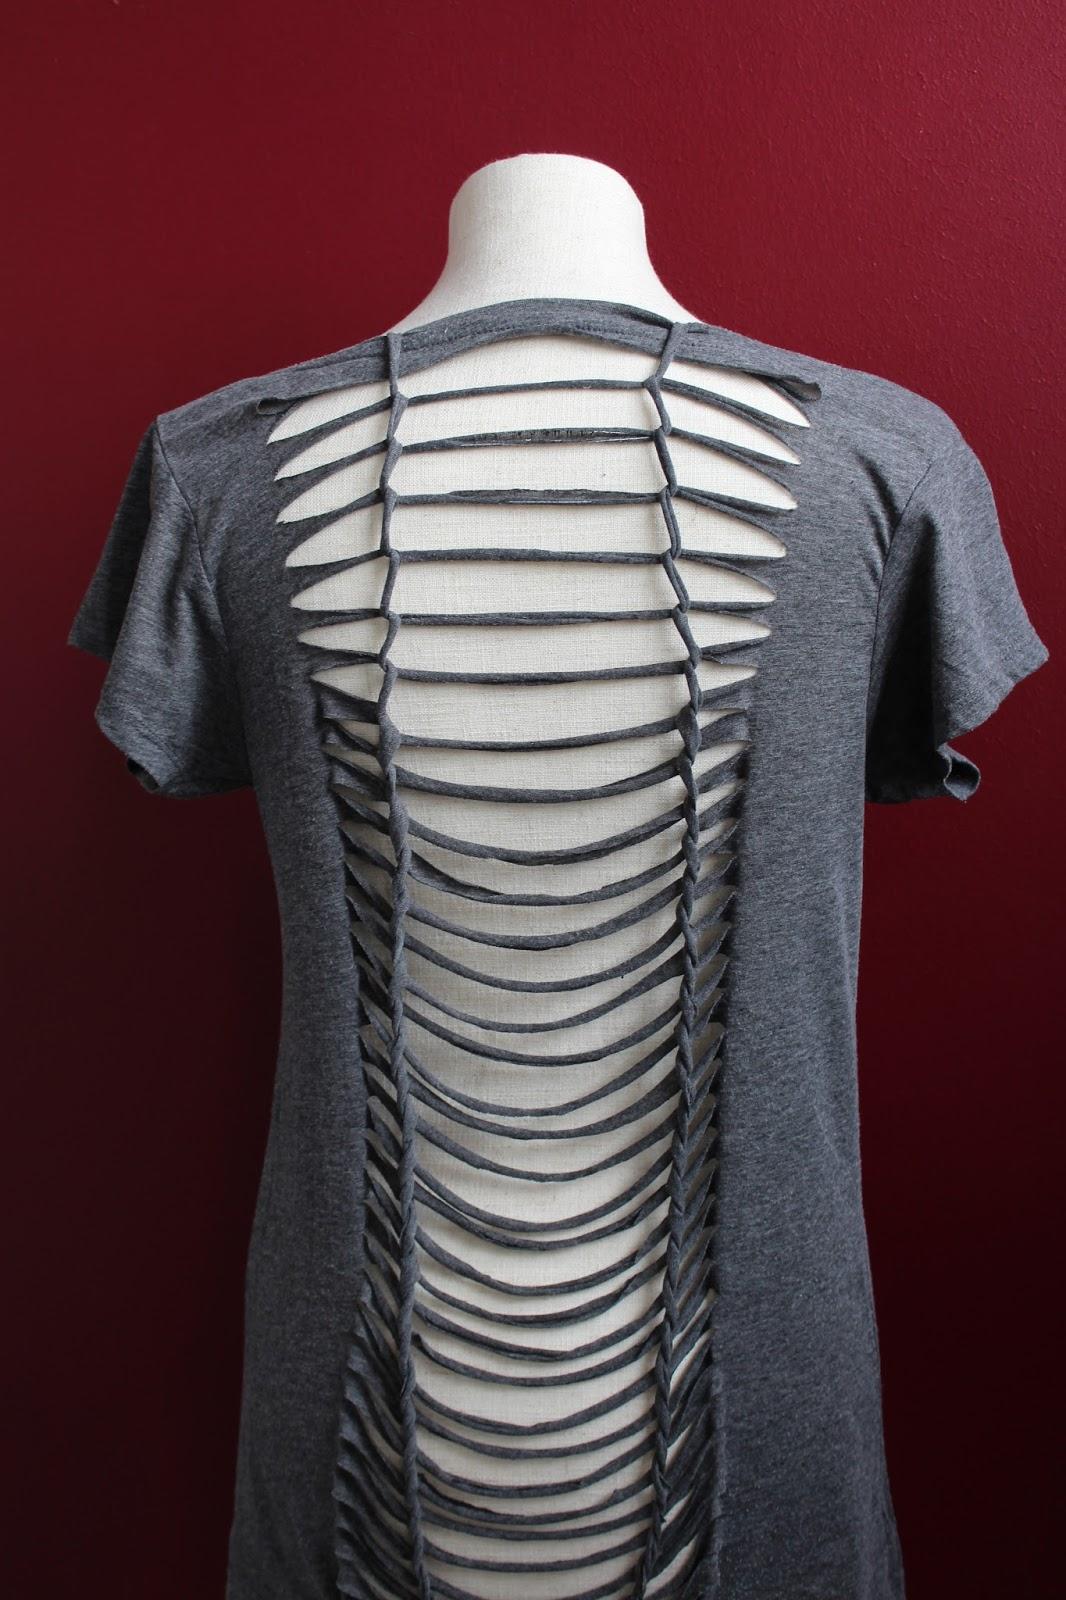 diy t shirt upcycling ars vera e diy blog f r kreative selbermacher. Black Bedroom Furniture Sets. Home Design Ideas